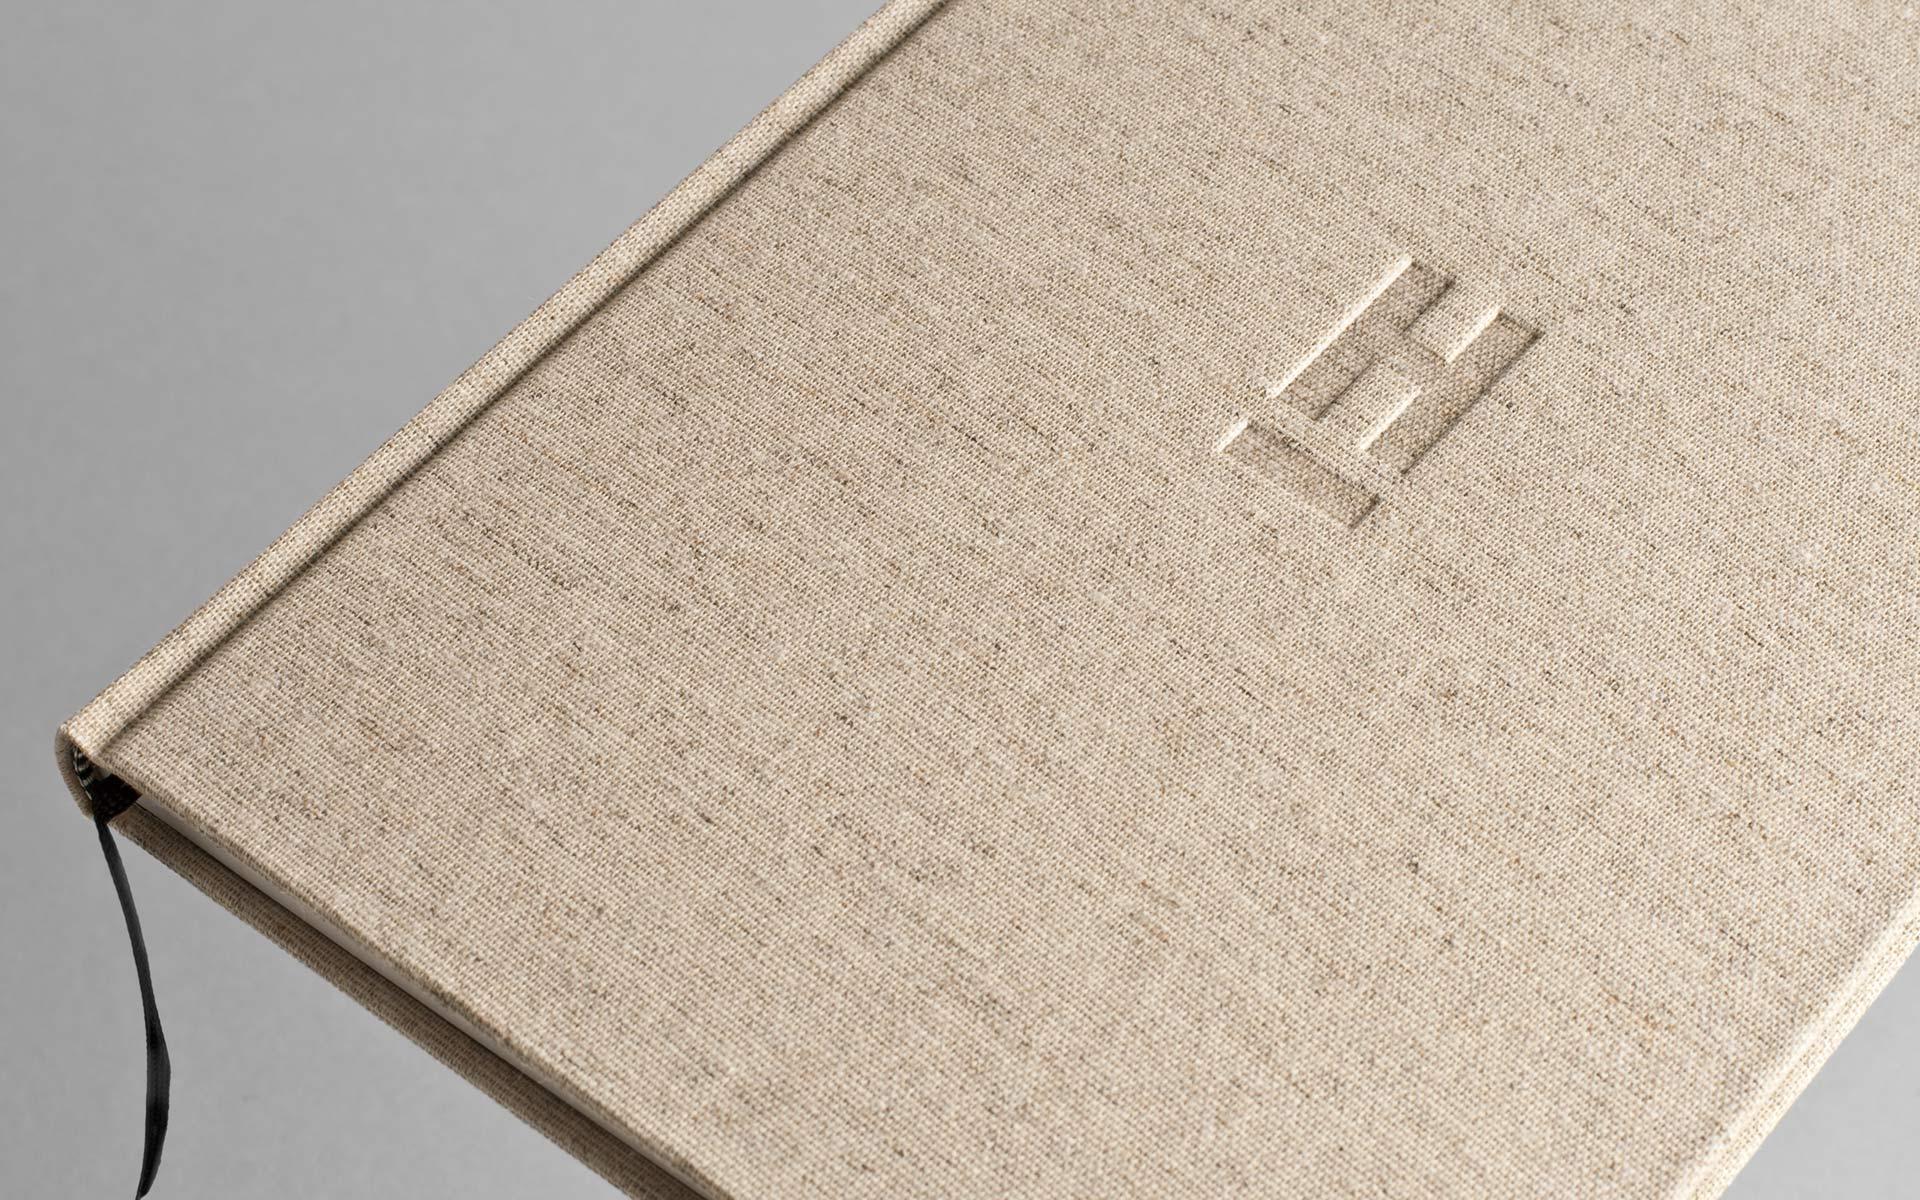 Cloth Cover Book Printing : Heydays expositio